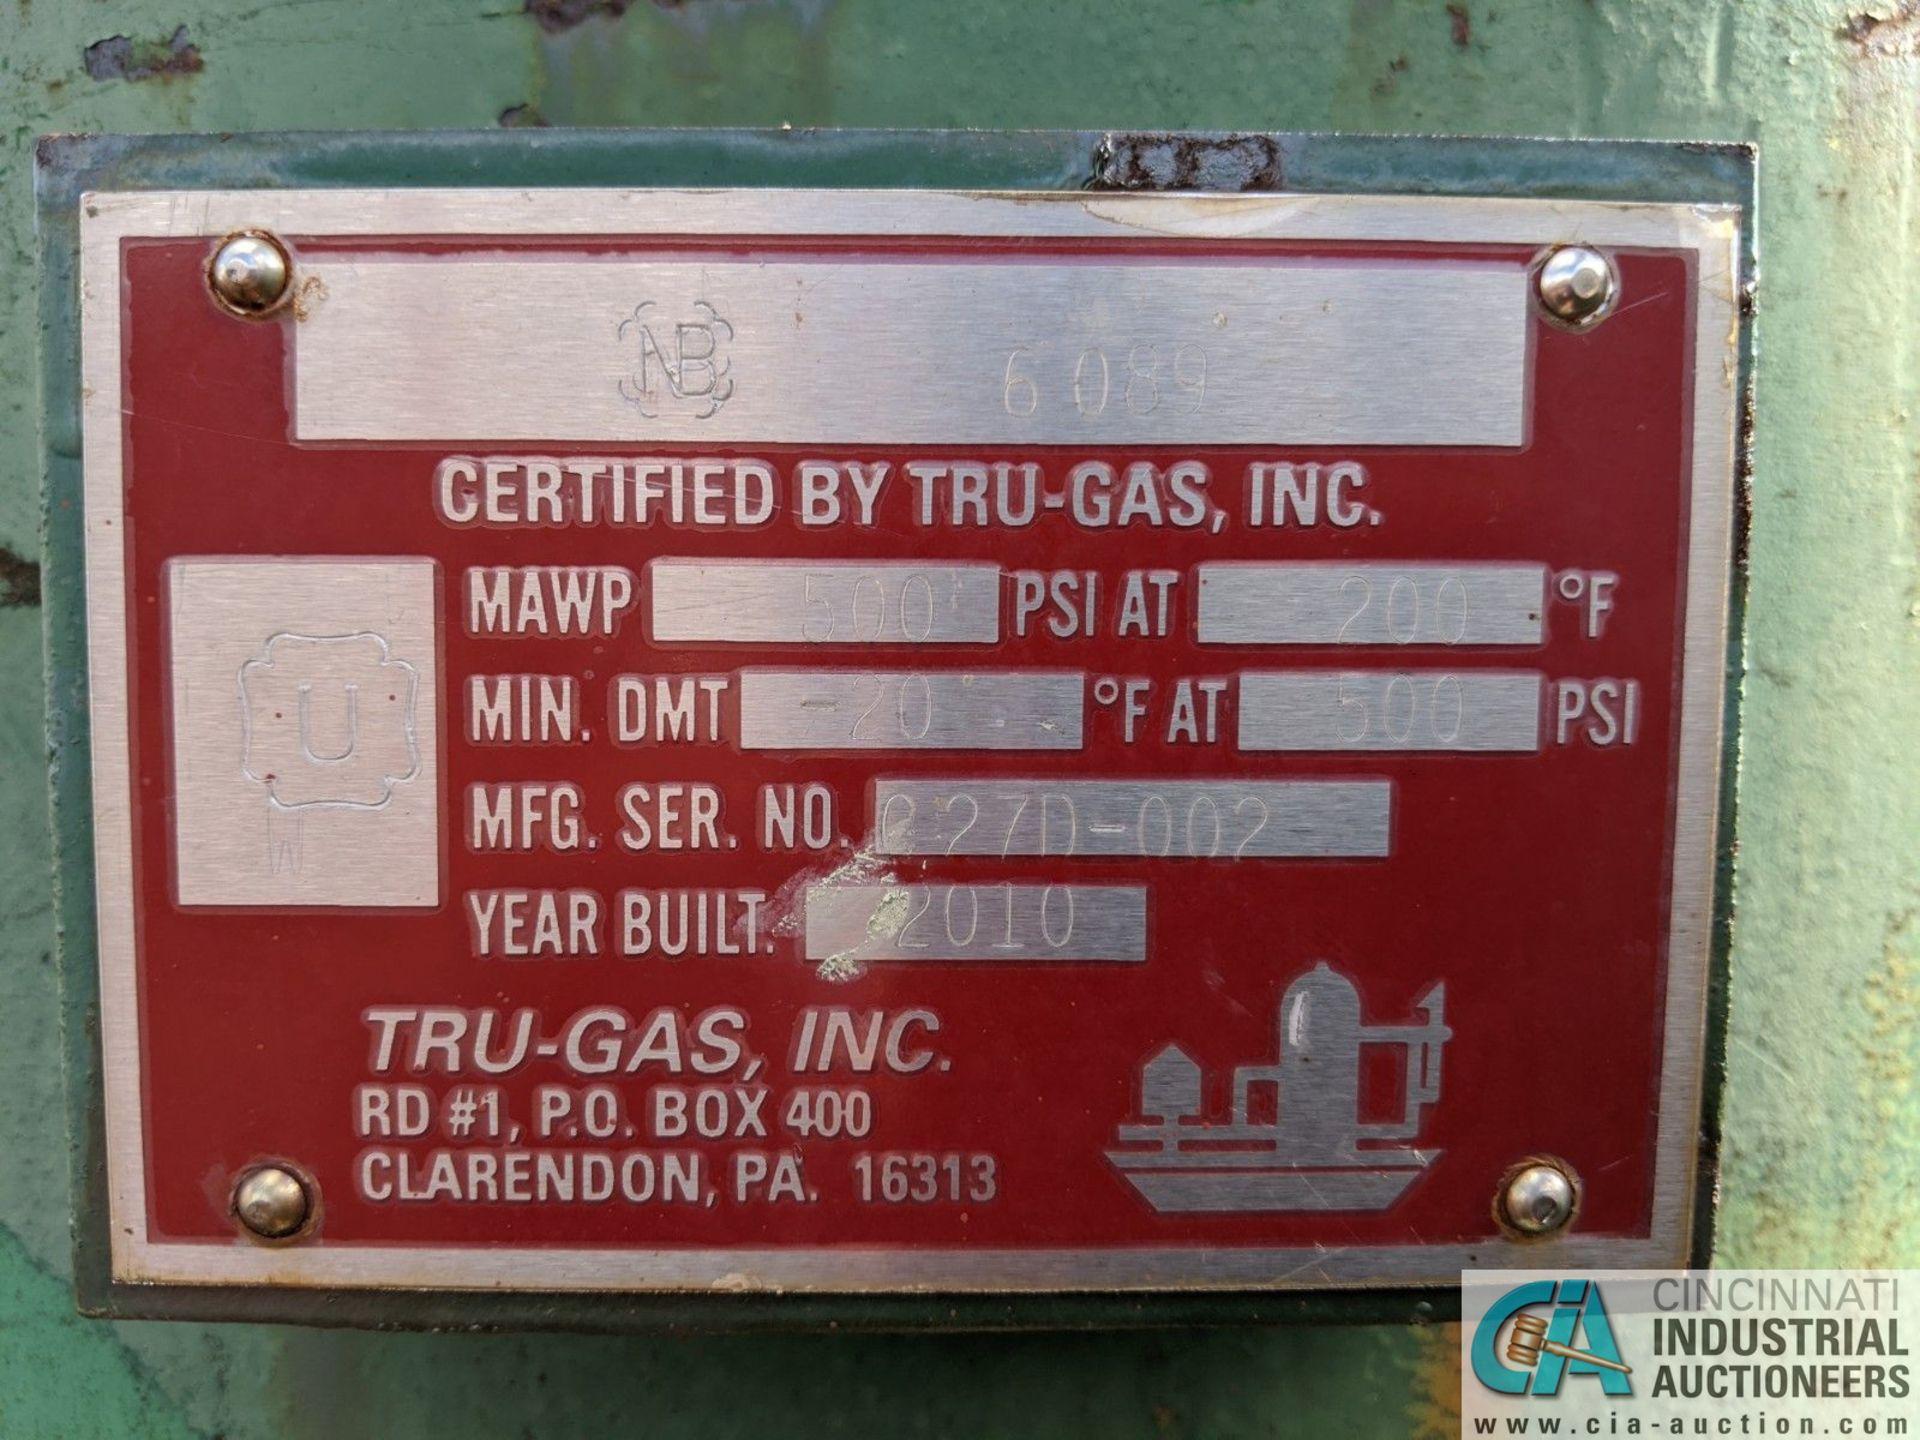 OIL / WATER SEPARATOR (8635 East Ave., Mentor, OH 44060 - John Magnasum: 440-667-9414) - Image 5 of 5